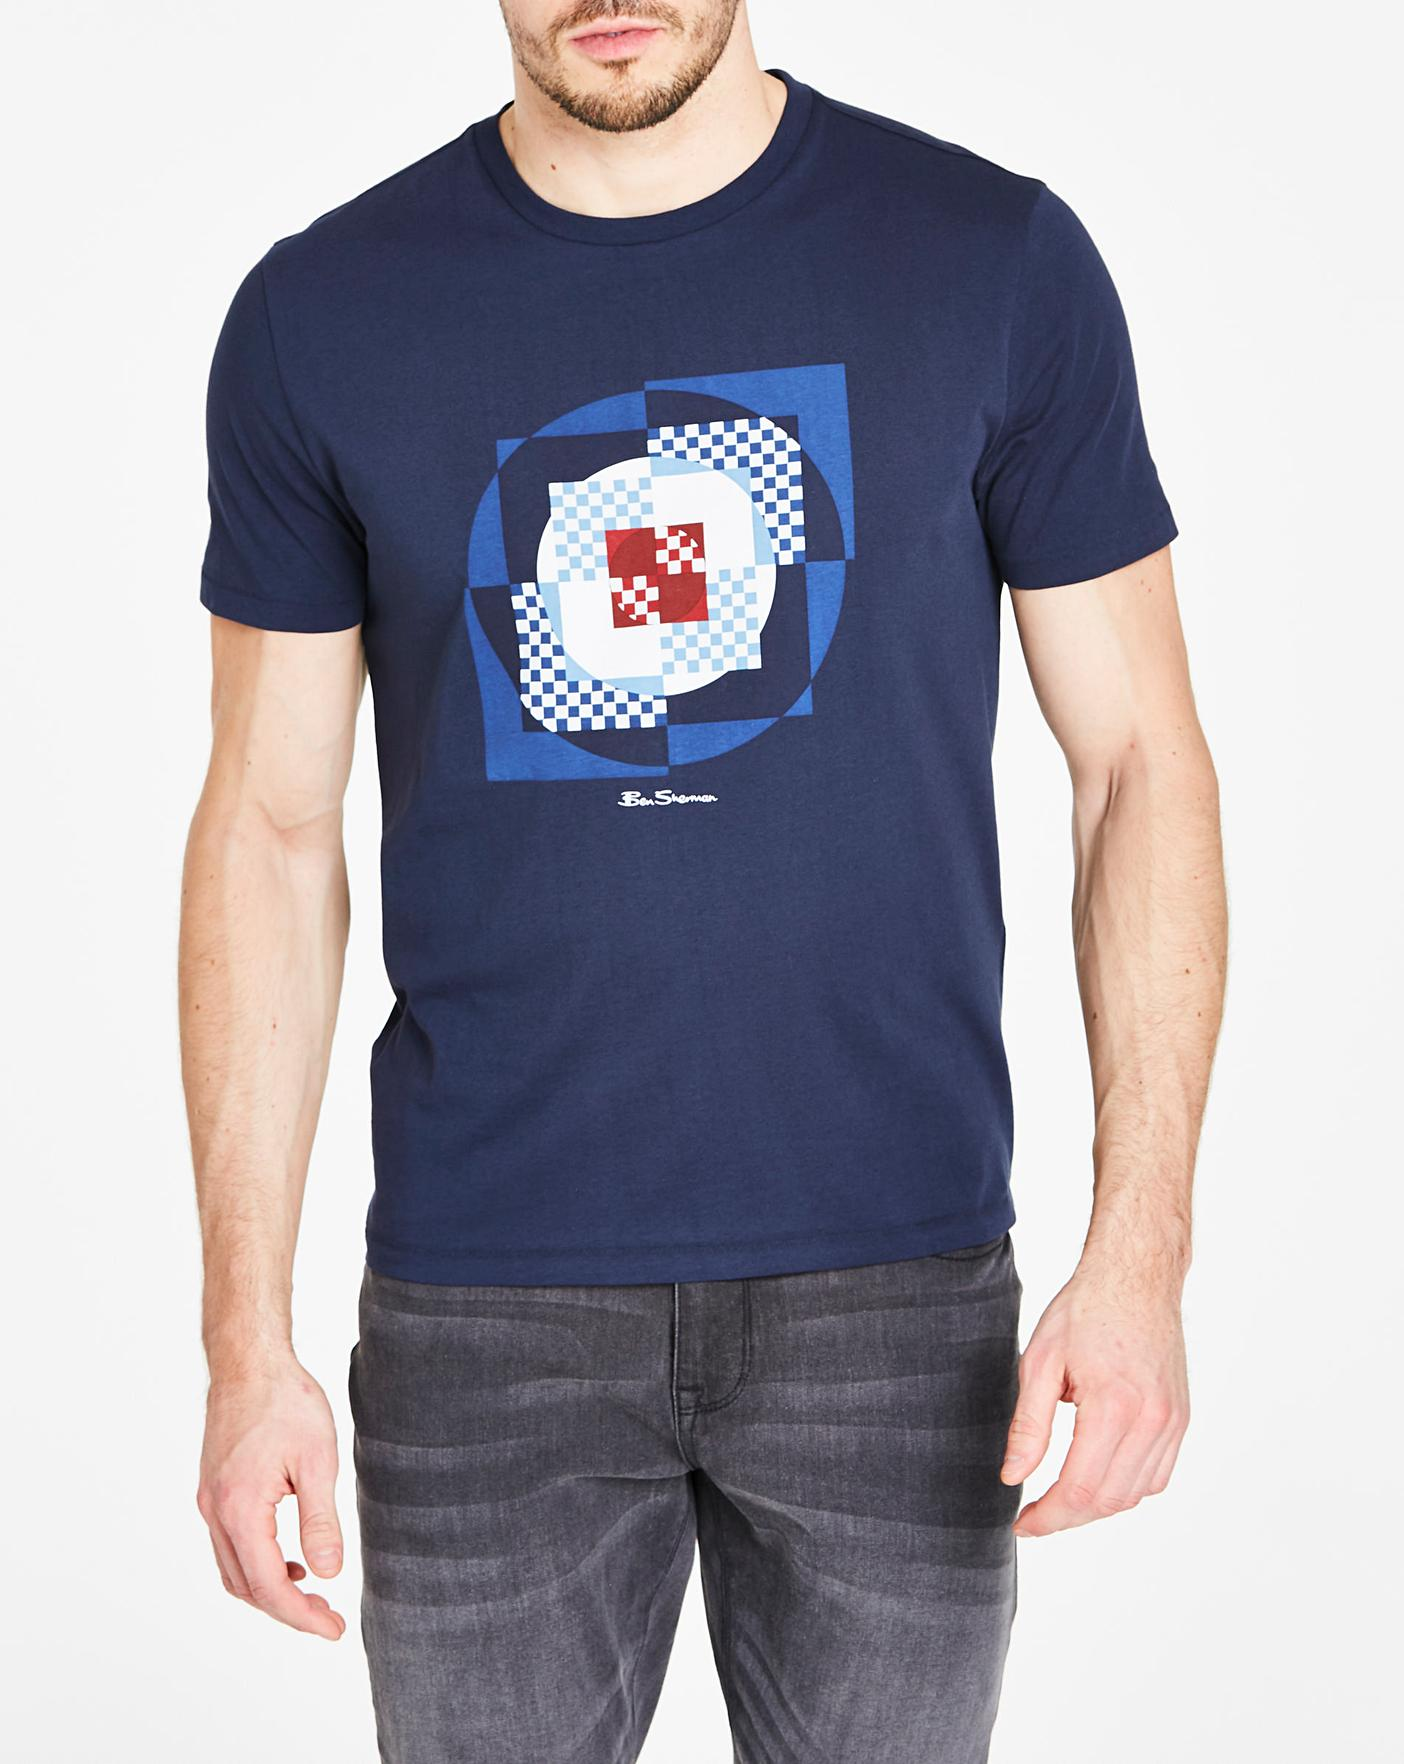 seda Insatisfecho Sin lugar a dudas  Ben Sherman Square Target T-Shirt | Oxendales